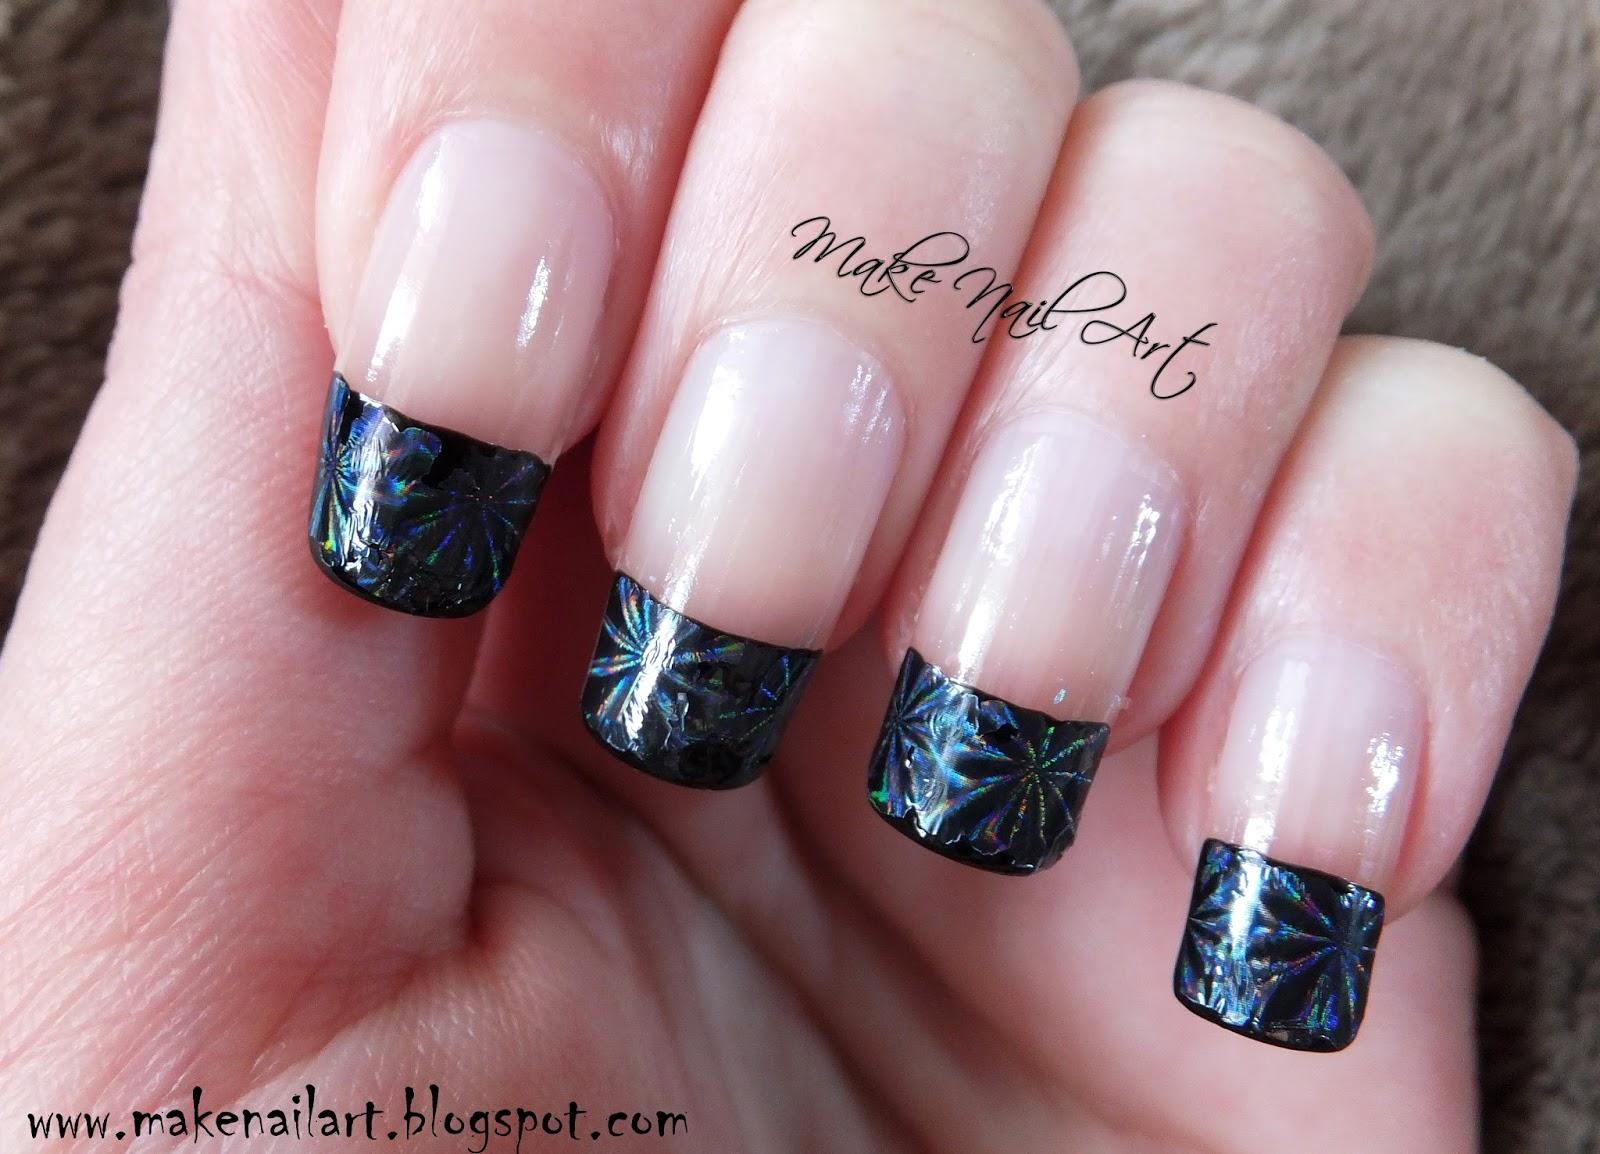 Make Nail Art: Black French Manicure With Nail Foil Nail ...